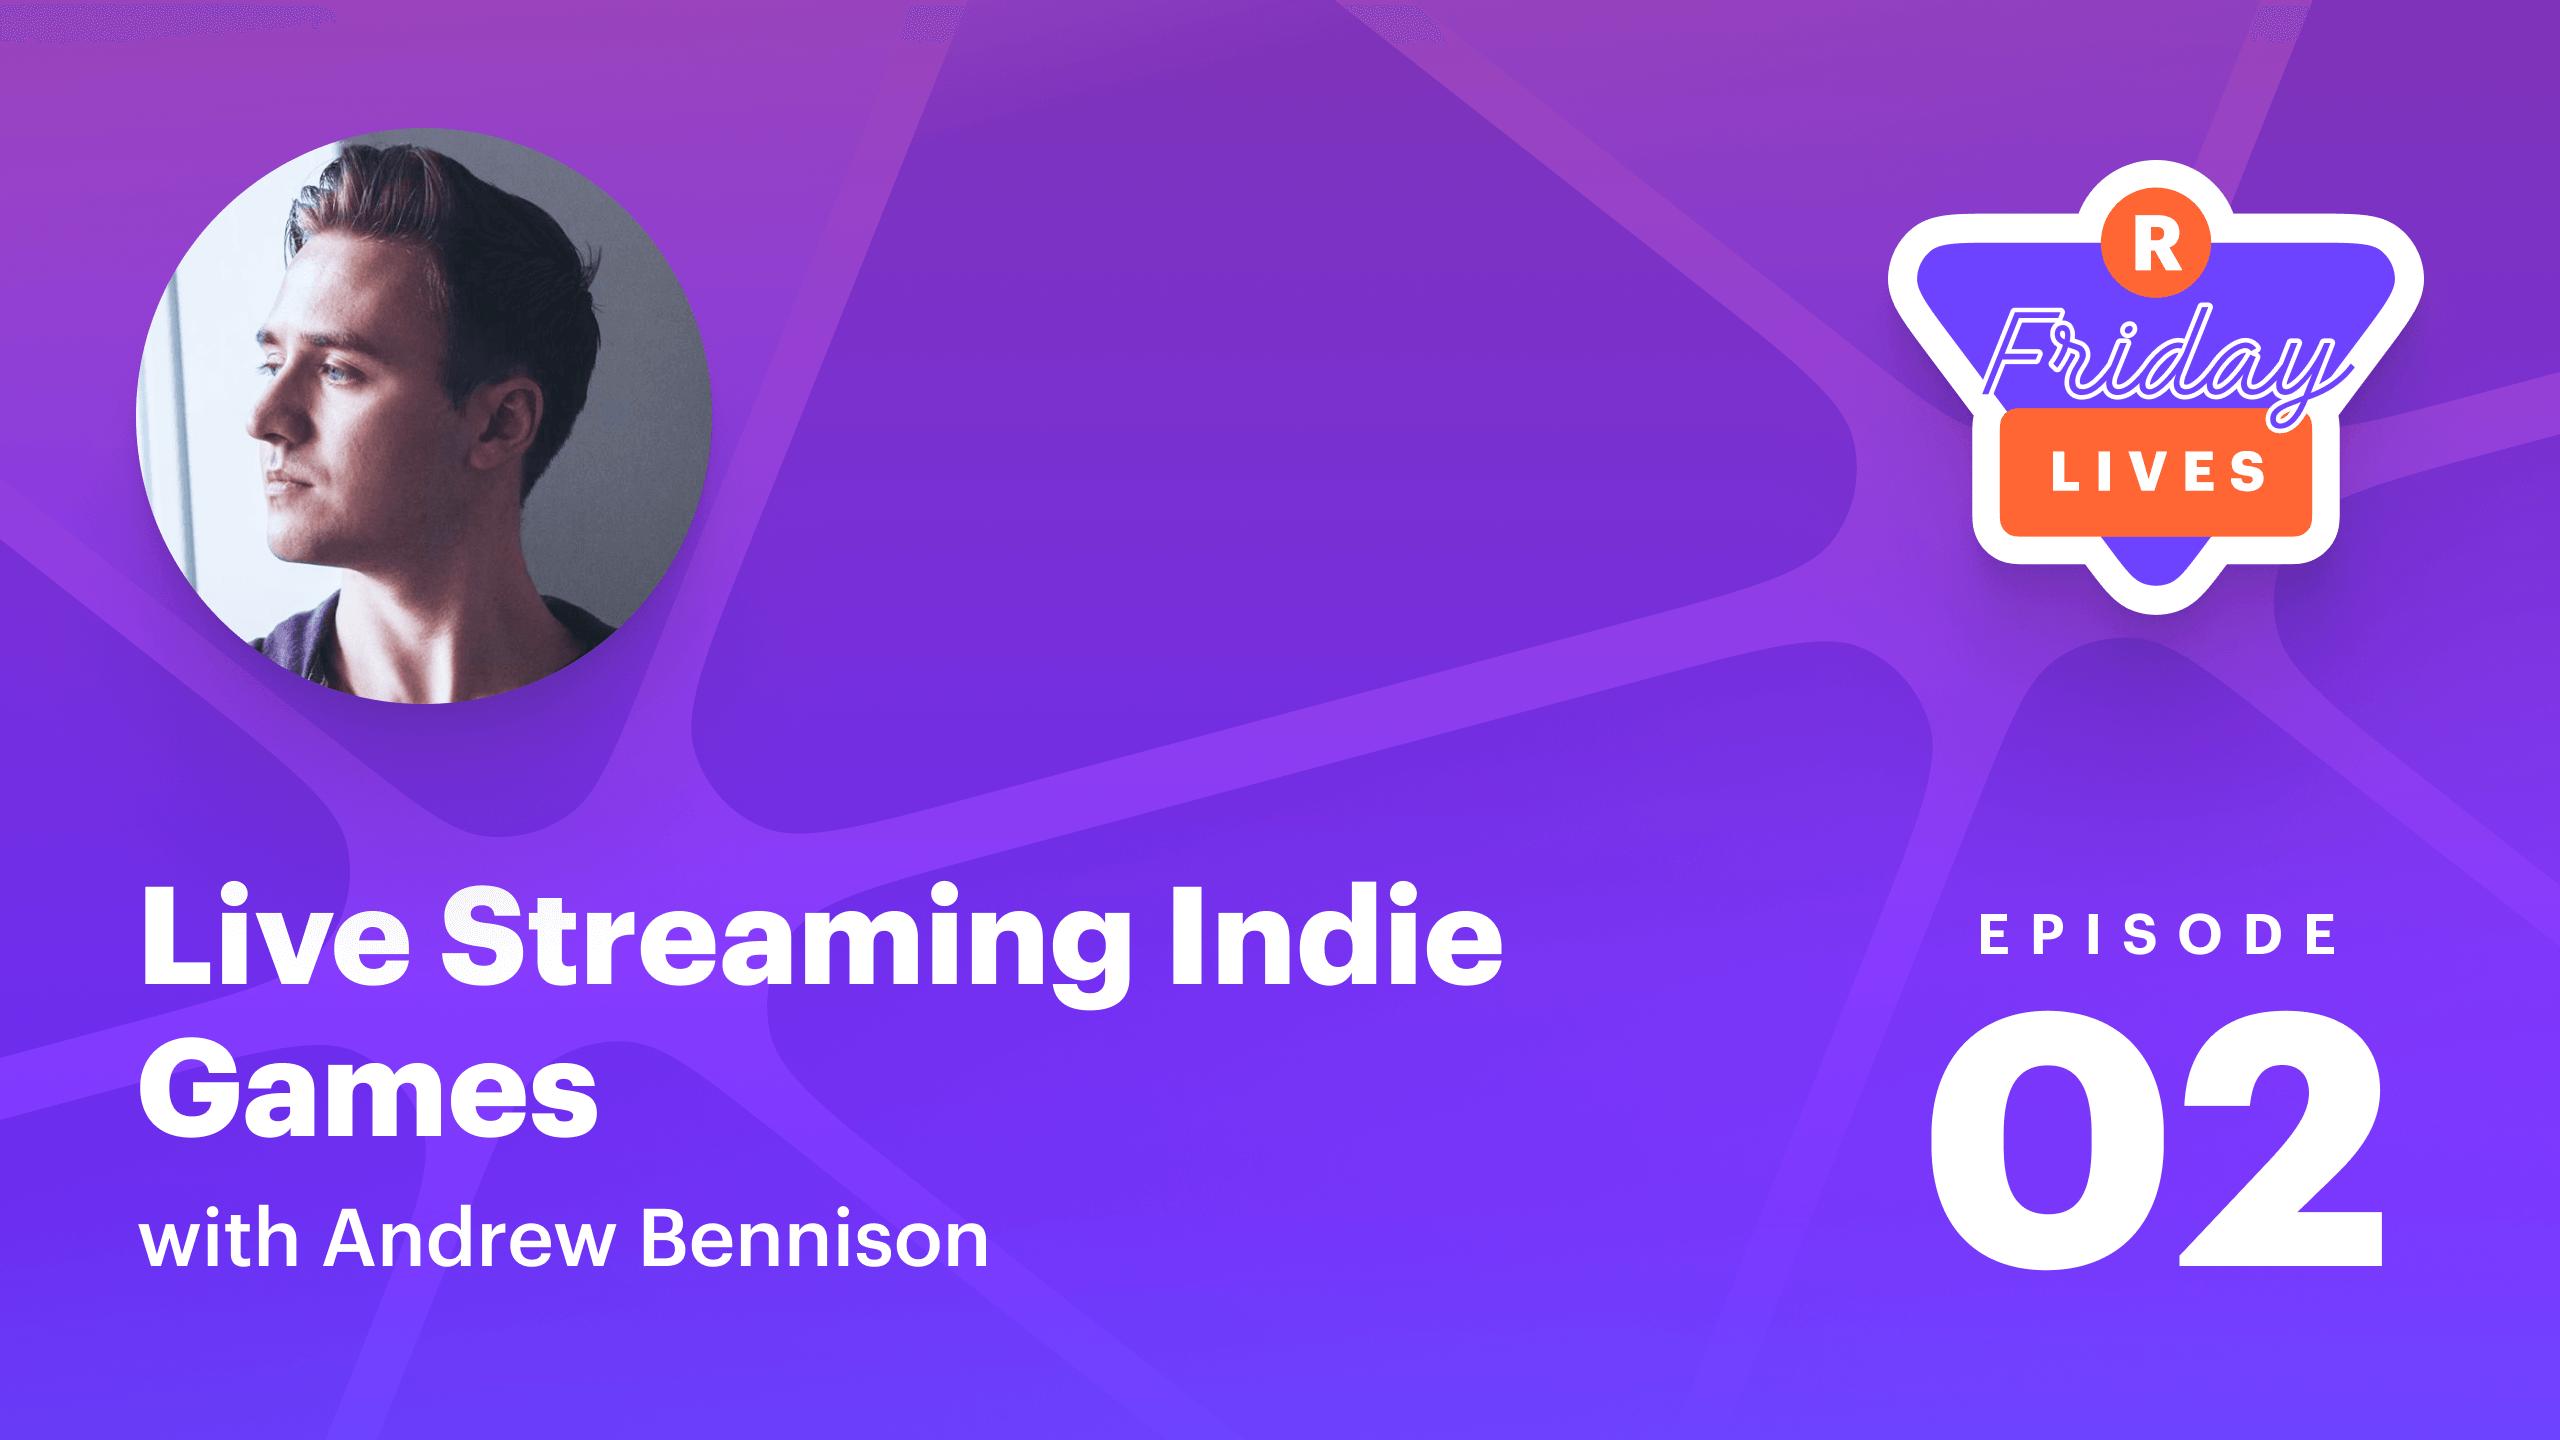 Live streaming indie games